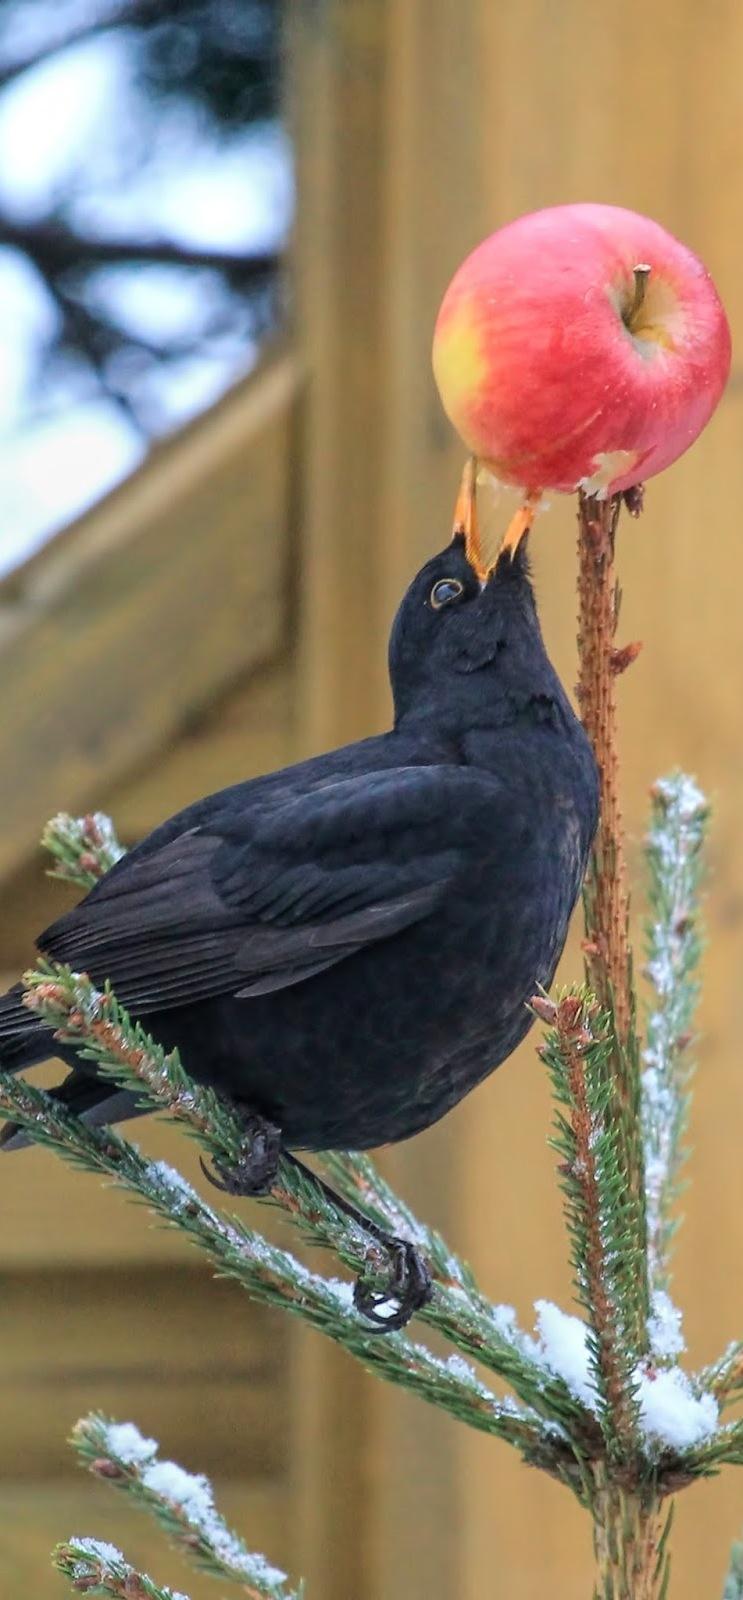 Blackbird apple trick.